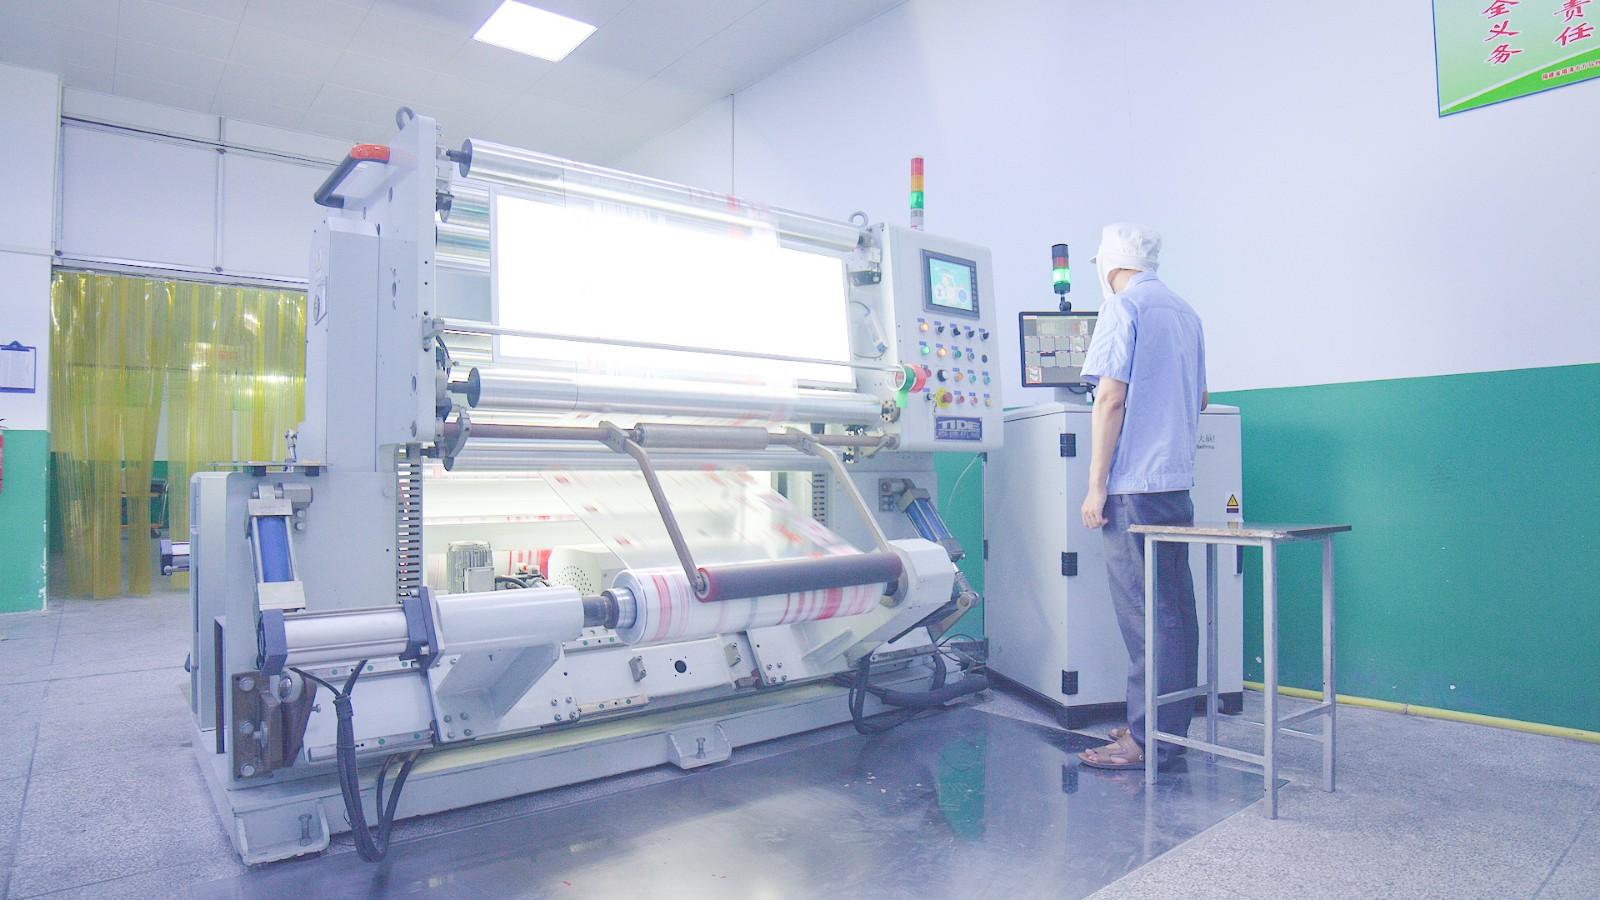 检品机 Inspection machine